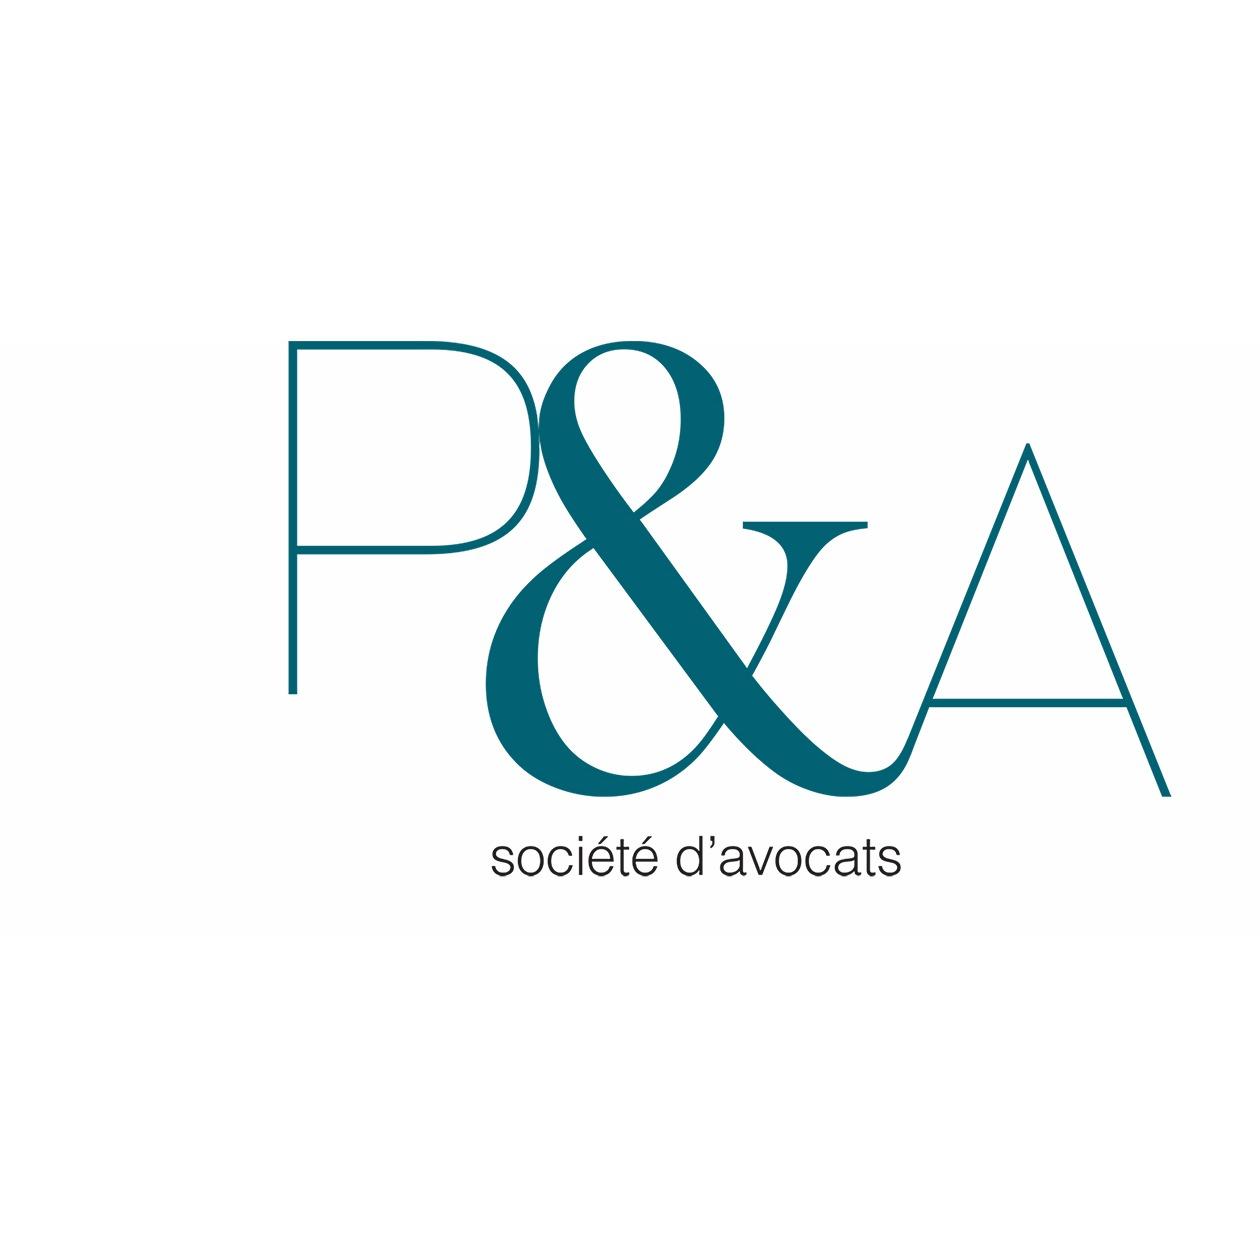 the Petrel & Associes logo.